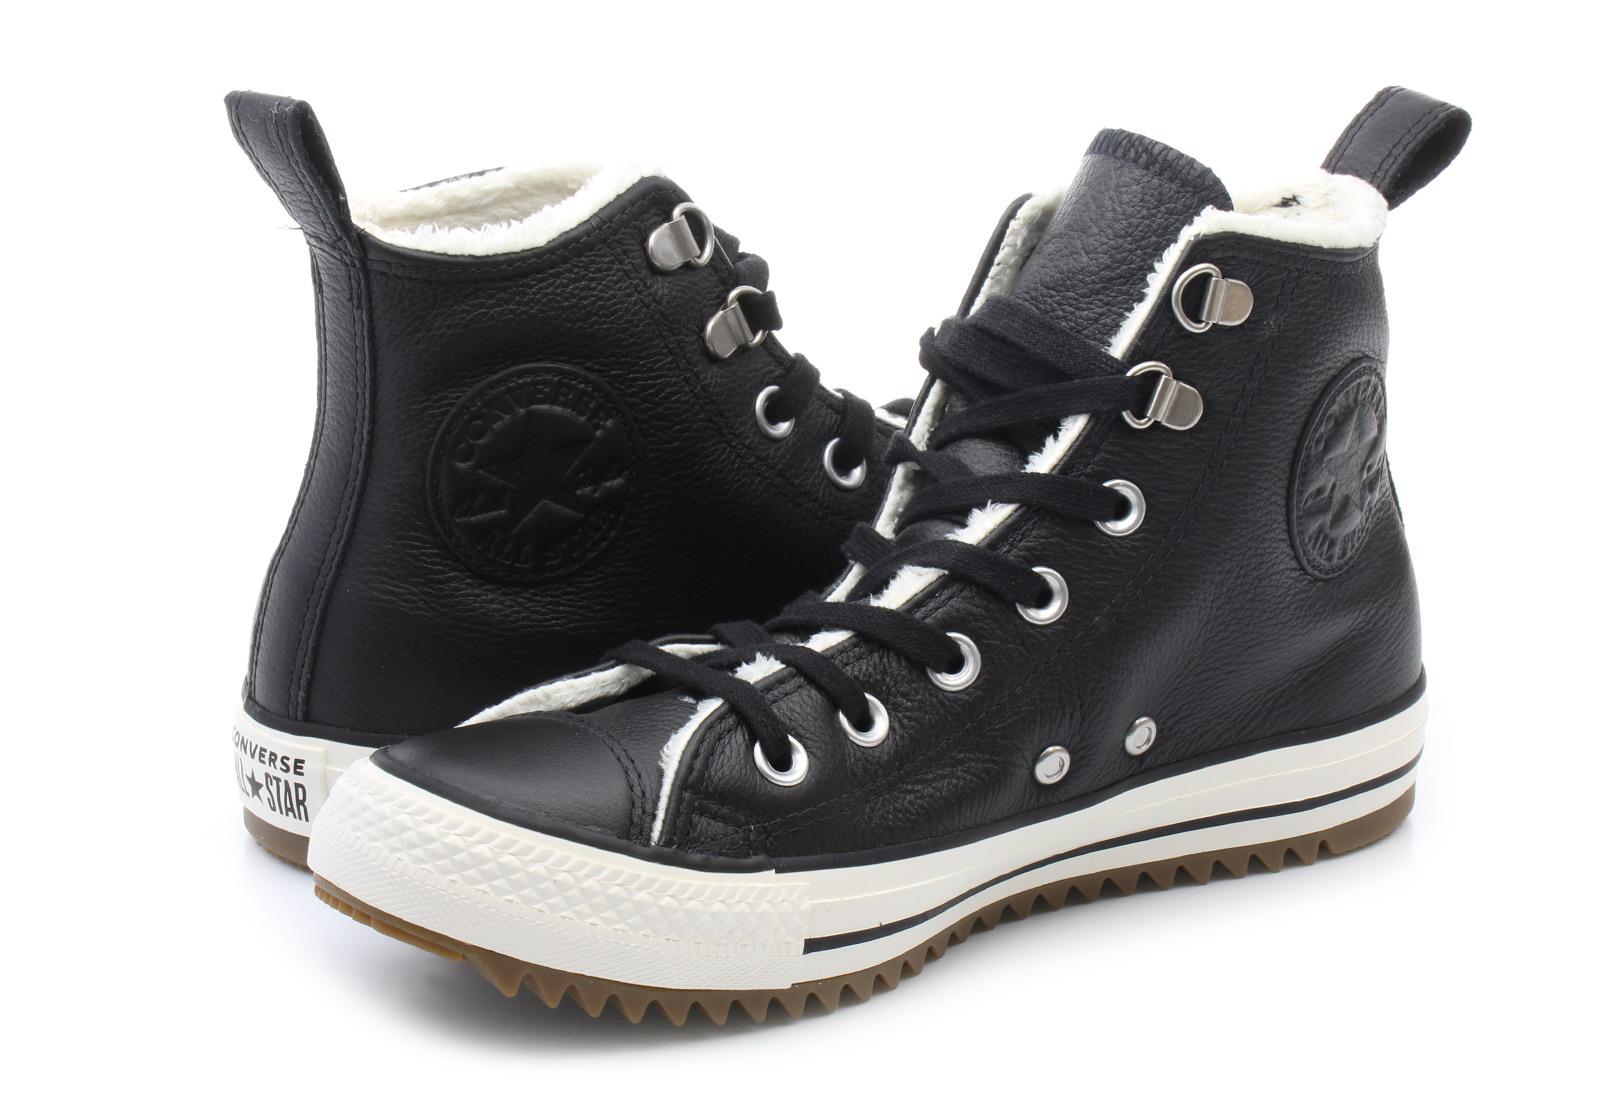 Converse Visoke Cipele Crne Tenisice - Chuck Taylor All Star Hiker Boot Hi  - Office Shoes - Online trgovina obuće 1dada2c0ebd